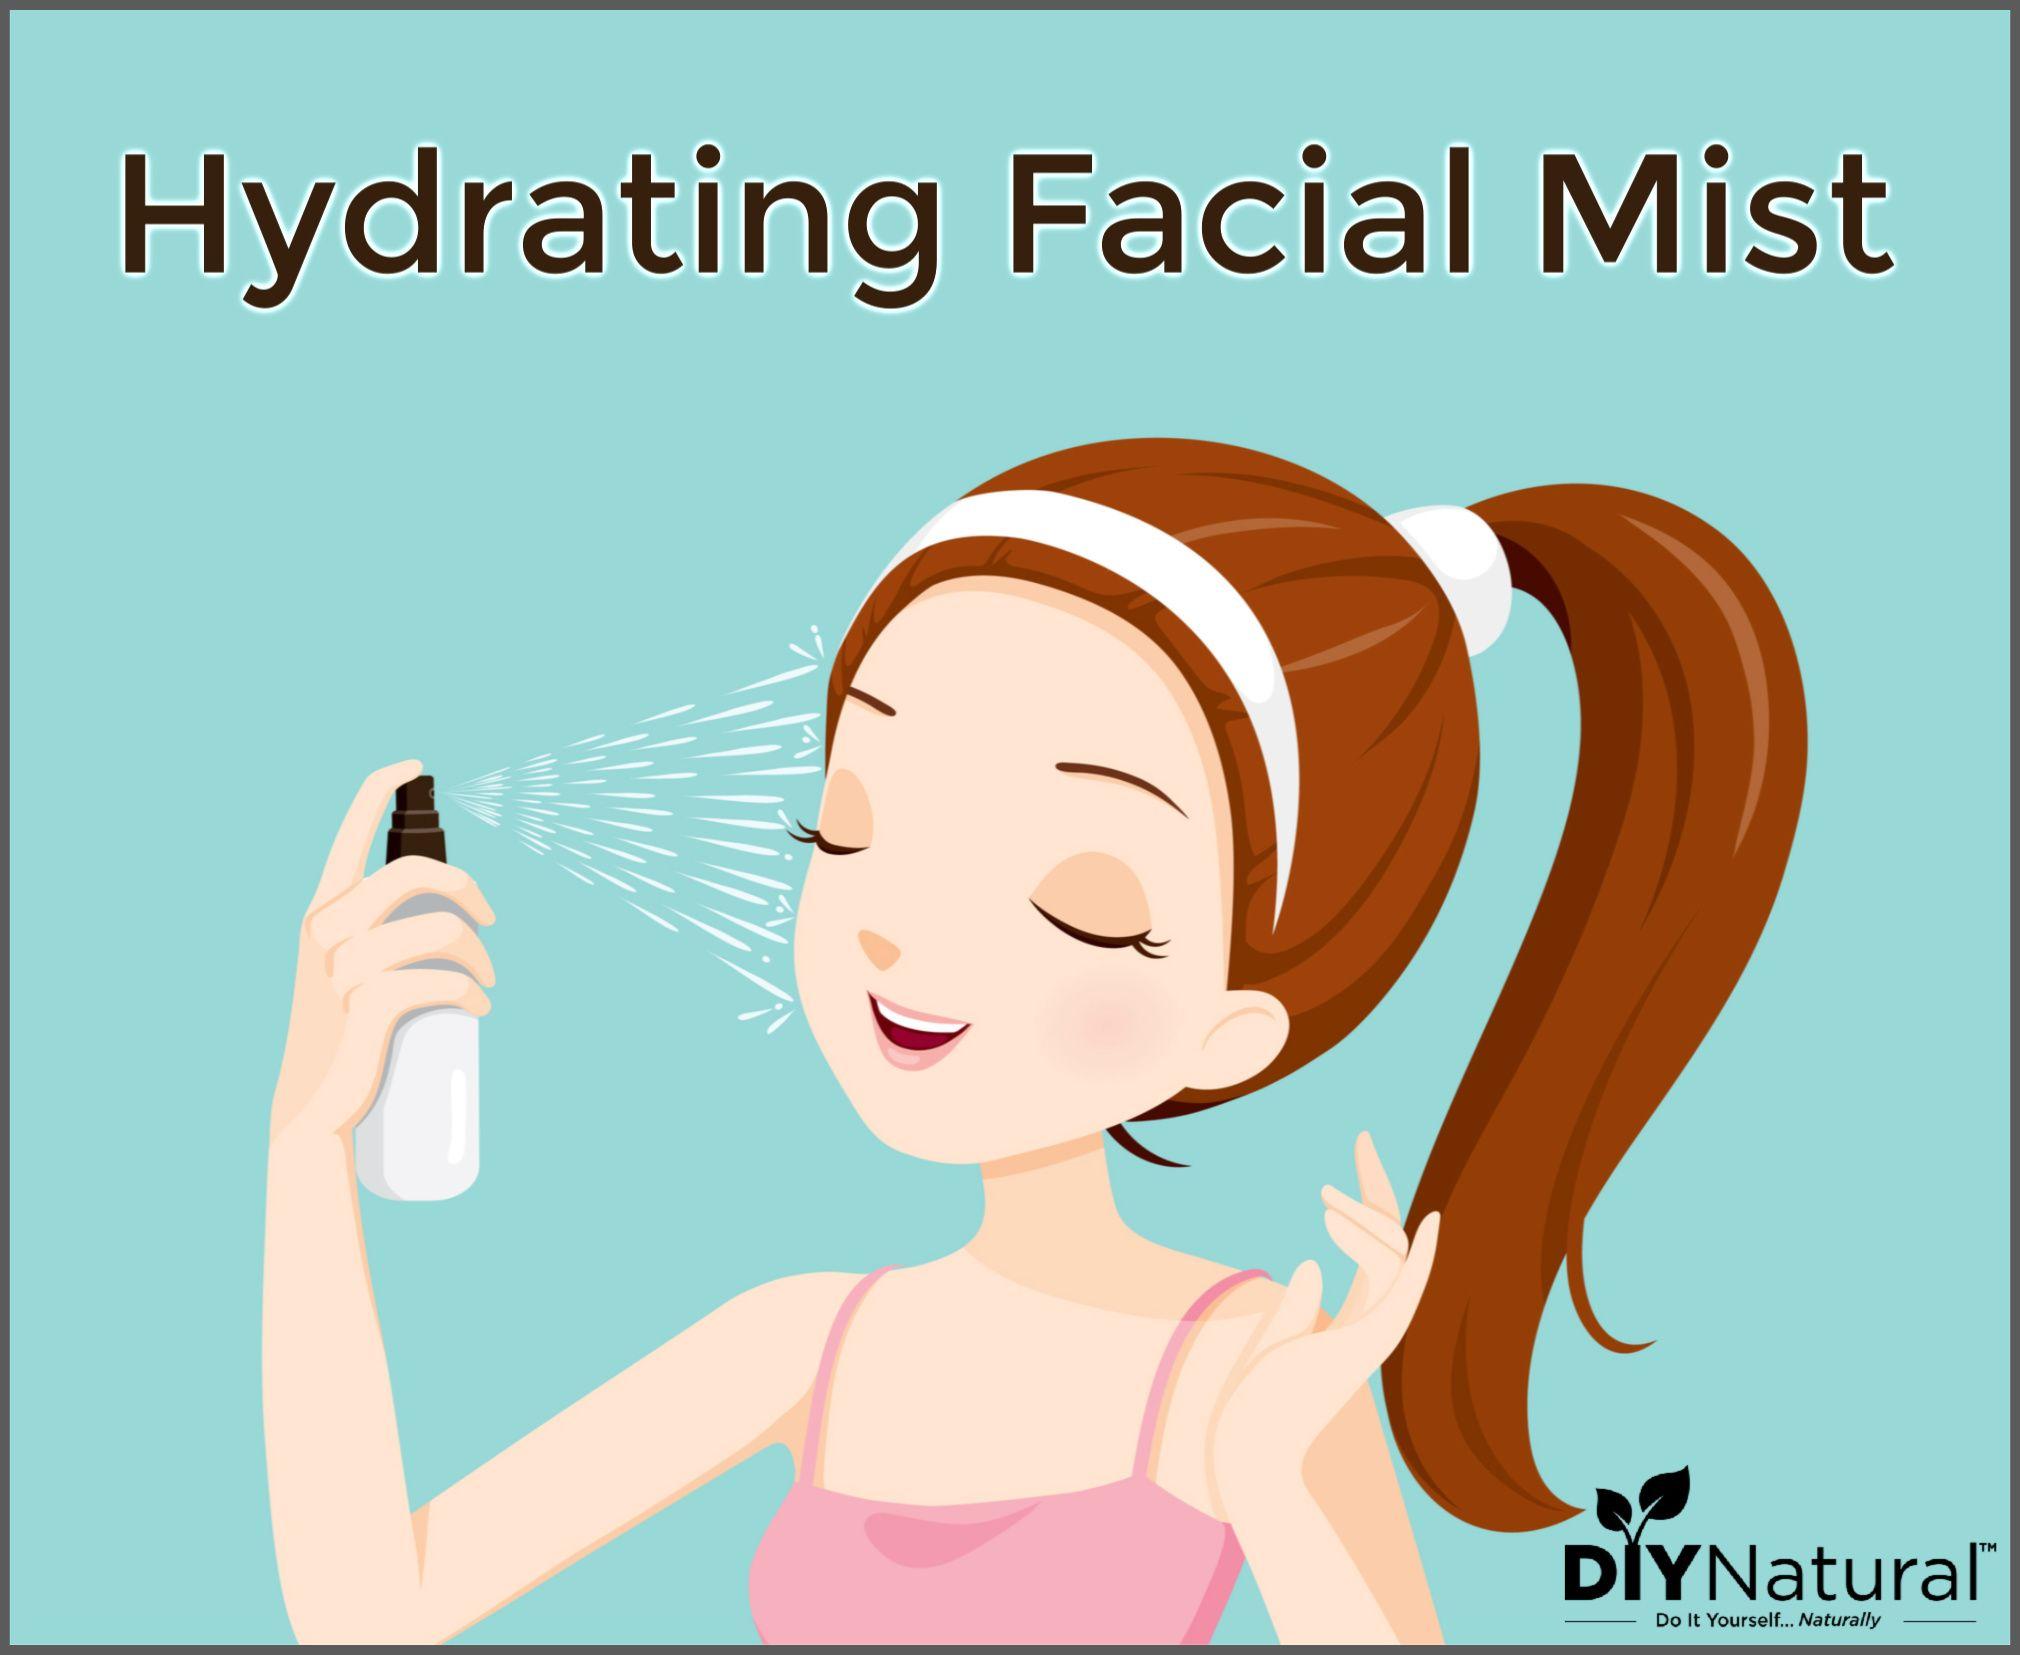 Facial Mist: A Simple DIY Hydrating Facial Mist to Moisturize Your Face